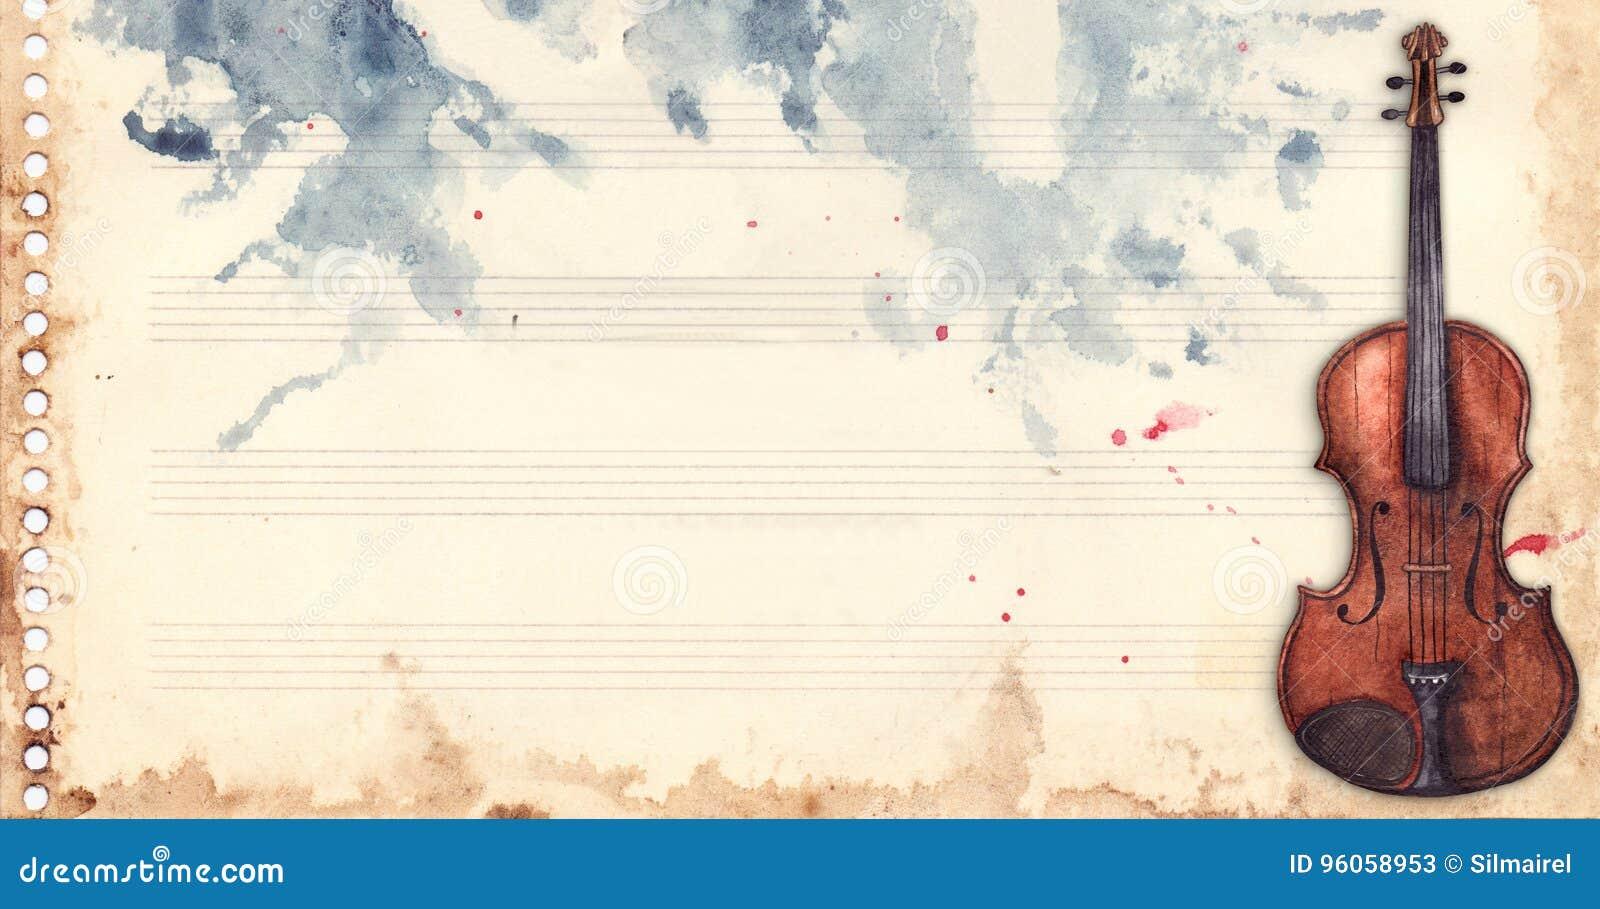 vintage retro watercolor music sheet violin musical